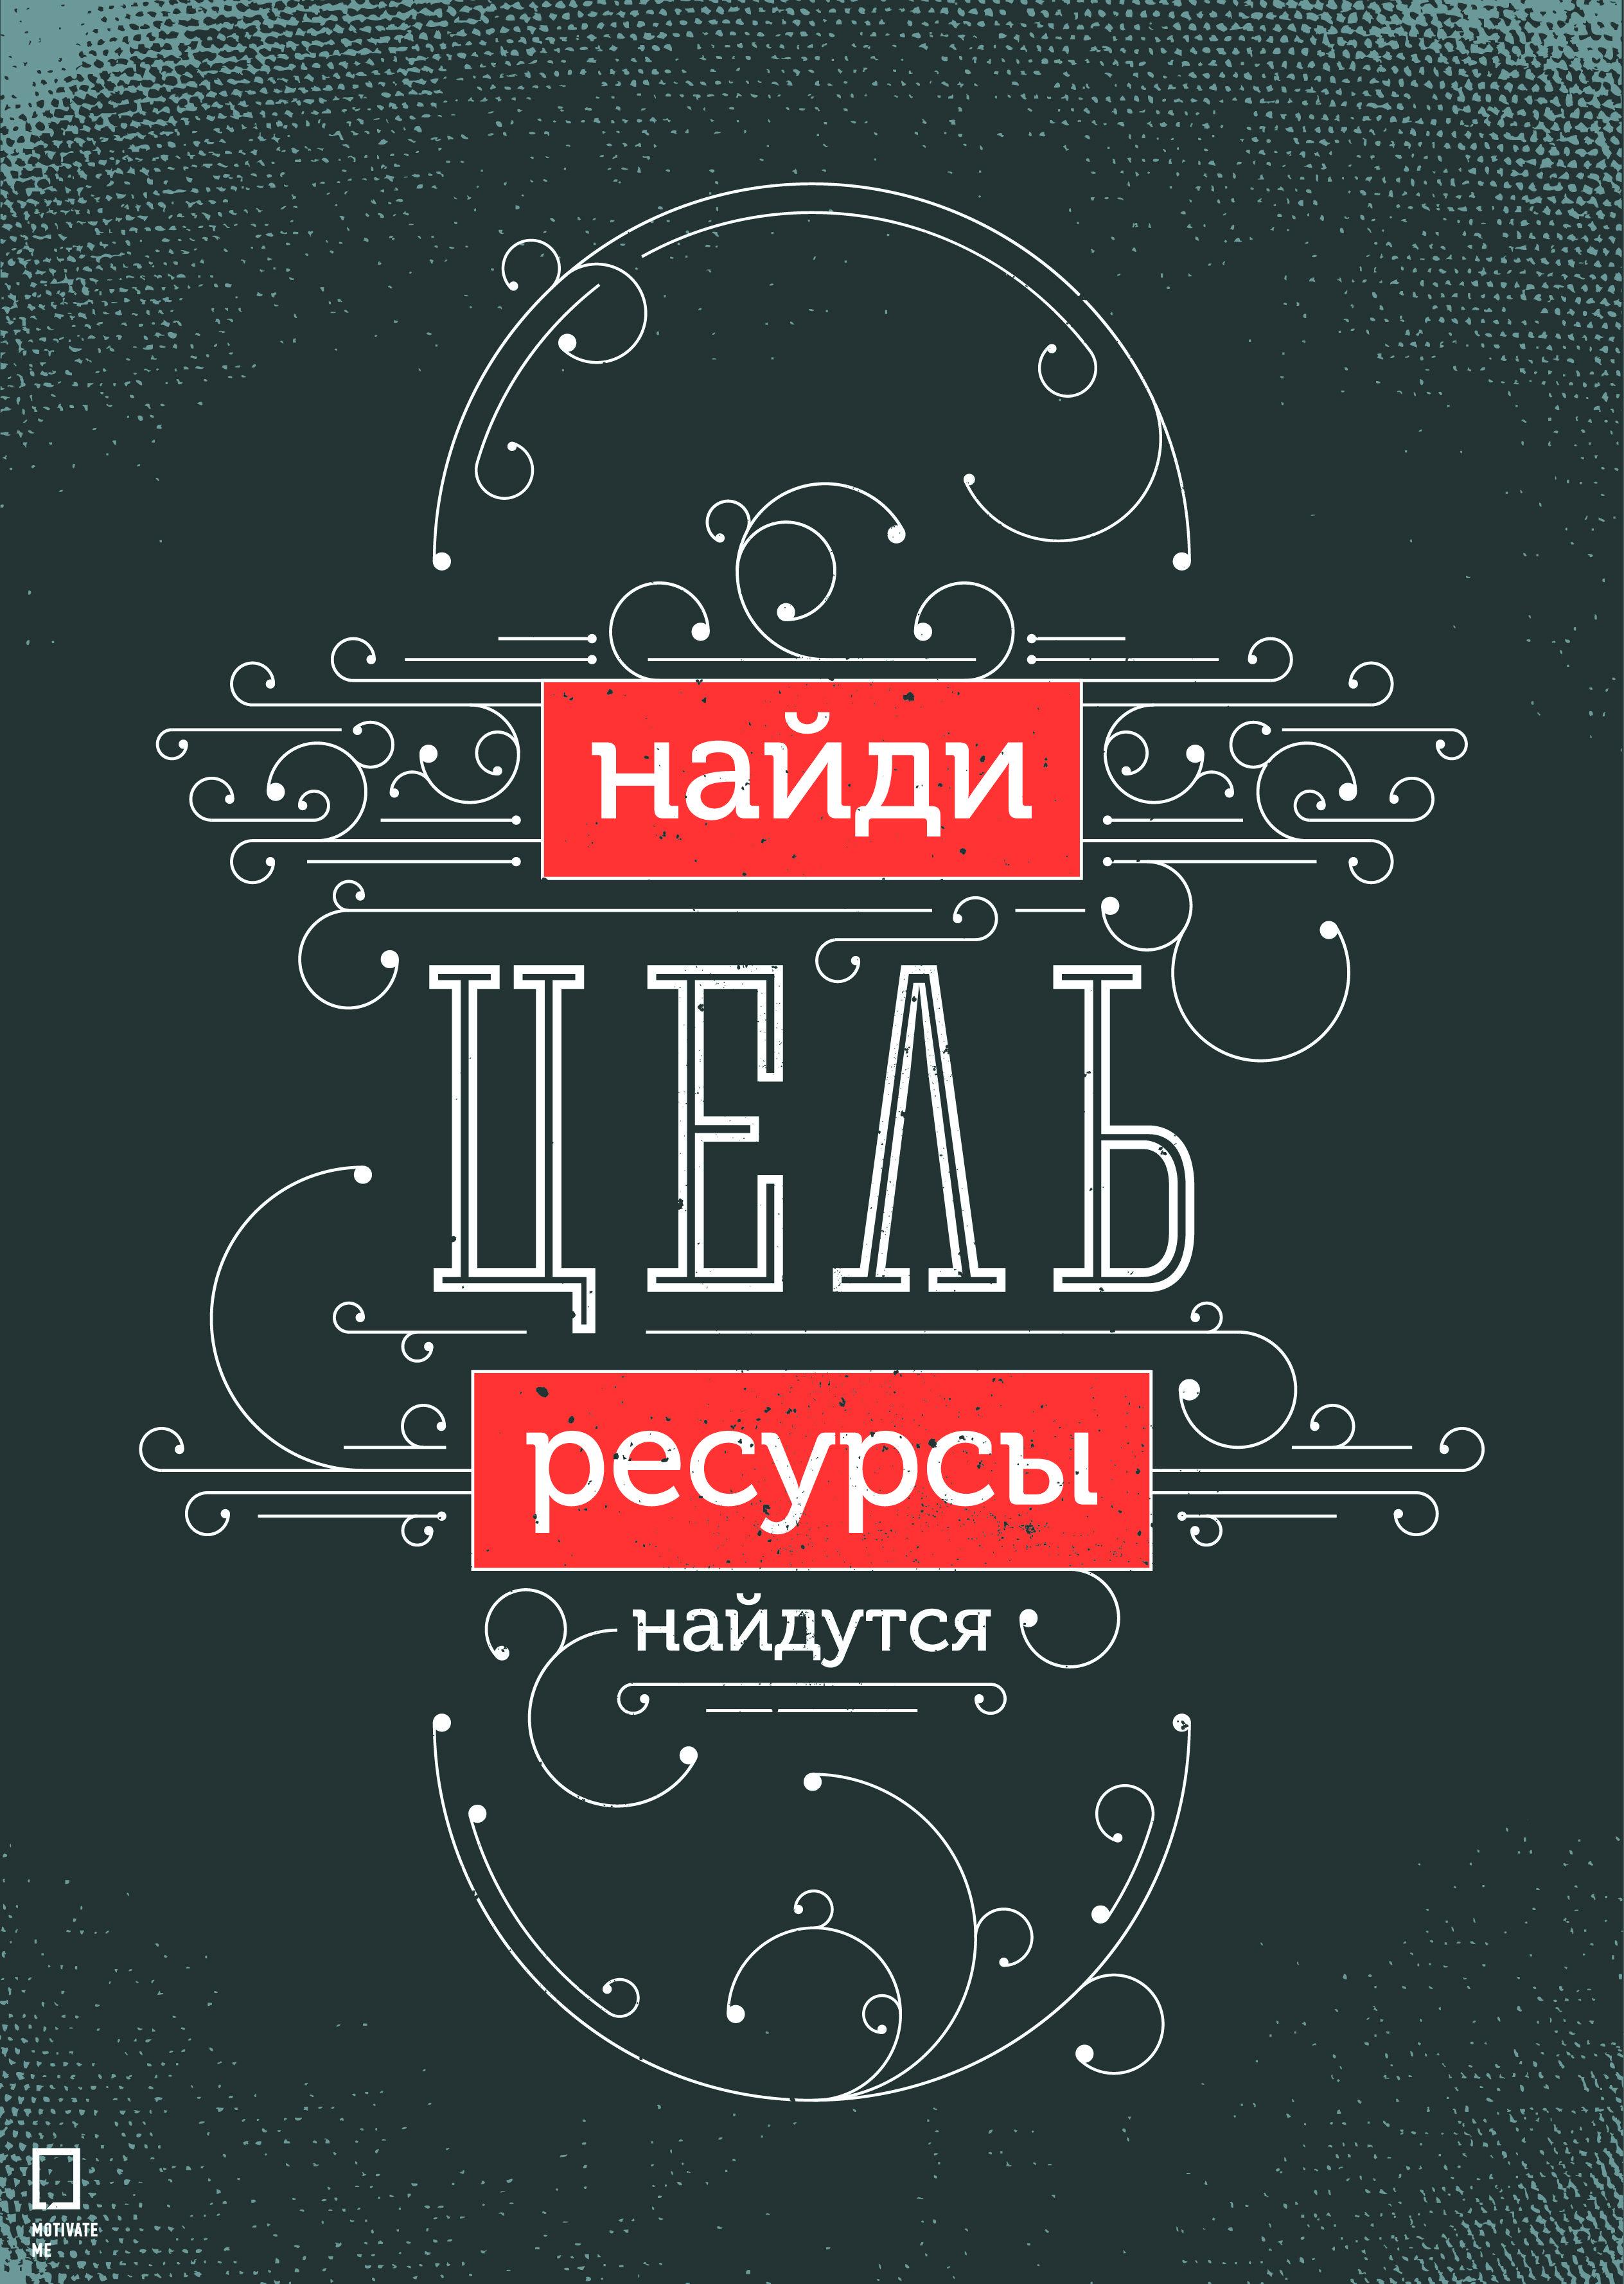 картинки с мотивирующими фразами на русском